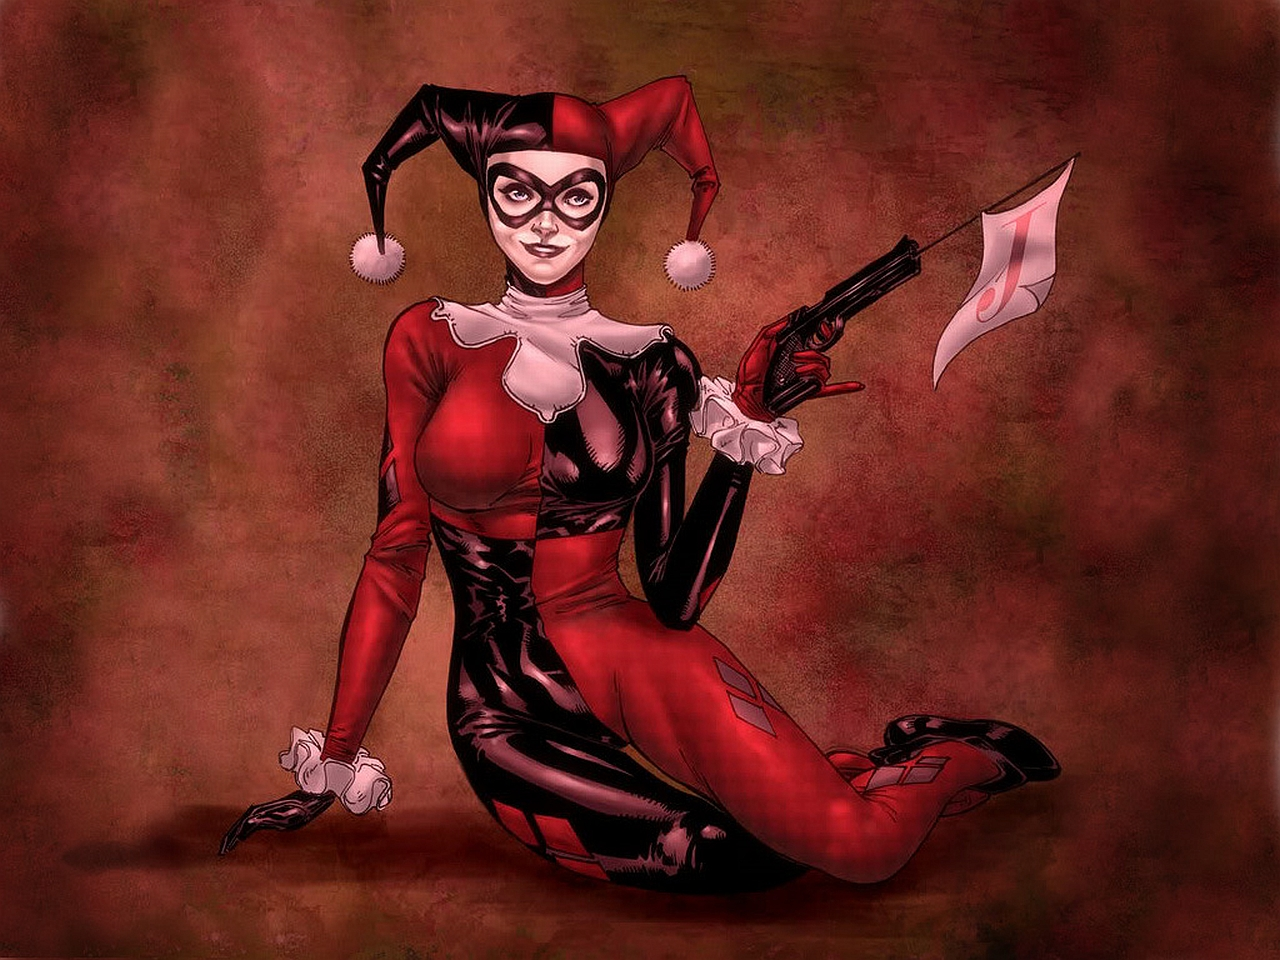 Harley Quinn Fonds dcran Arrires plan 1280x960 ID263191 1280x960